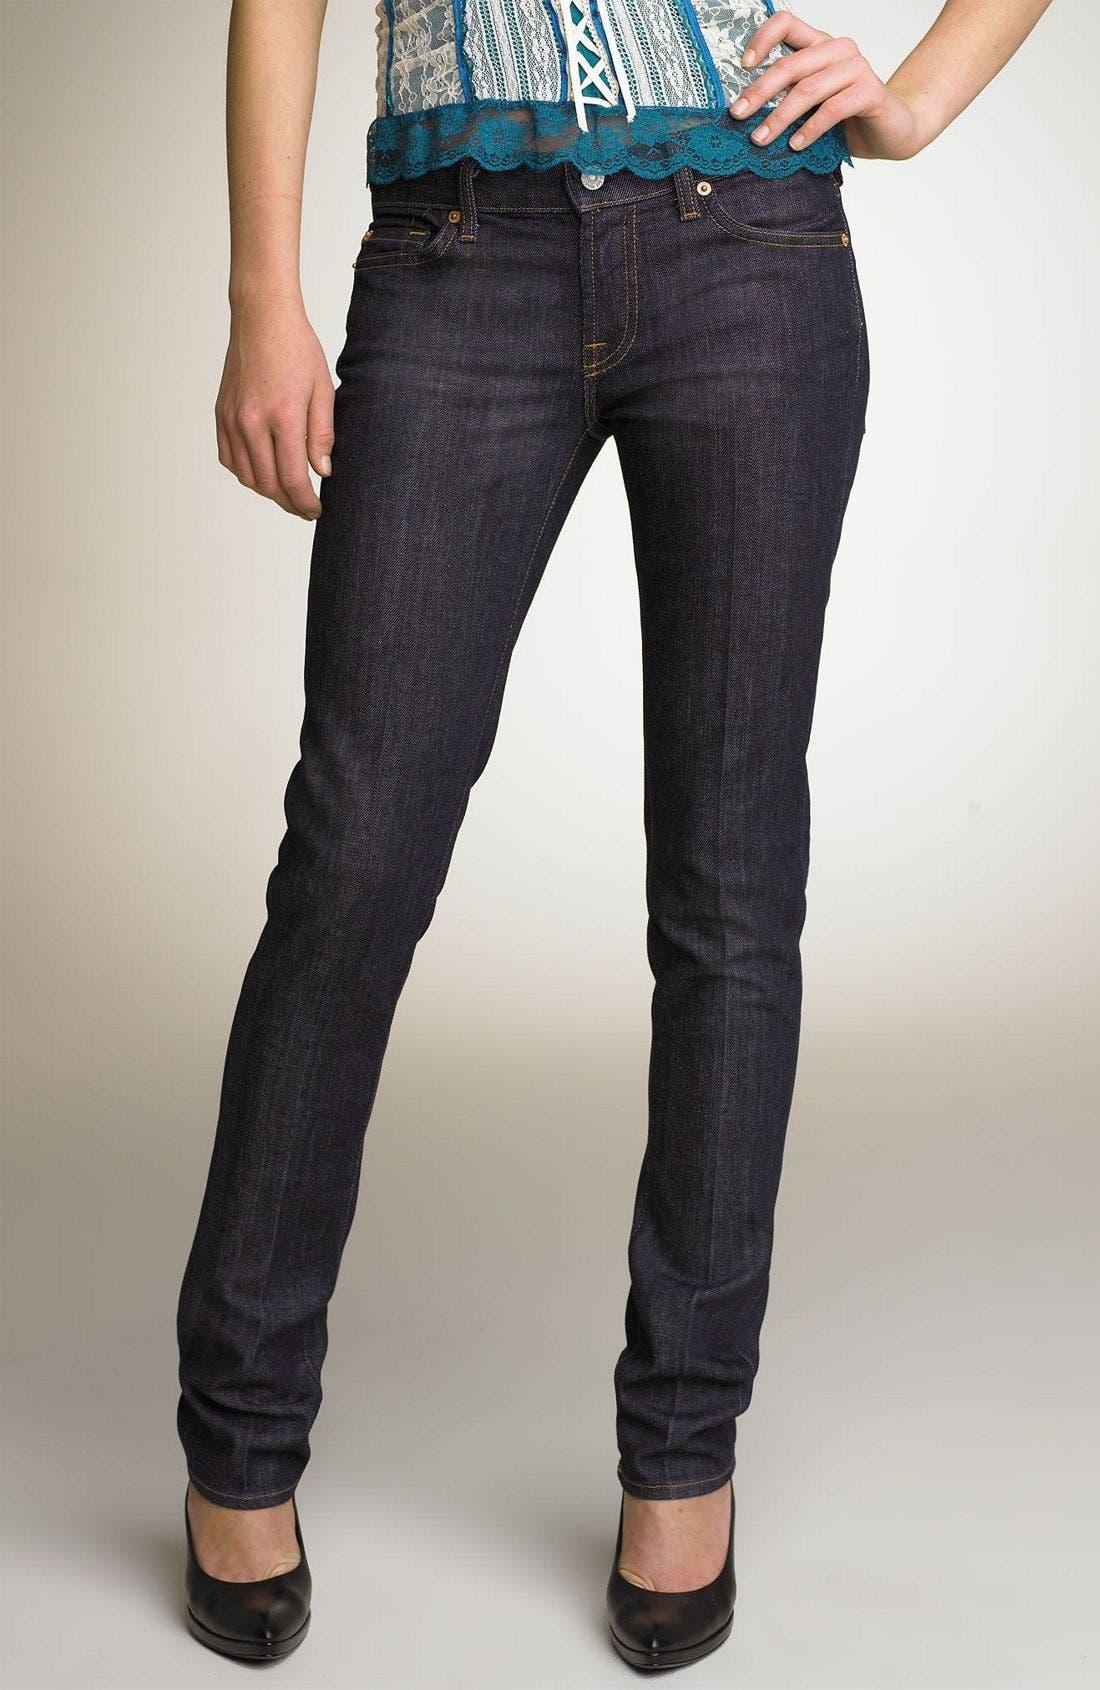 Alternate Image 2  - 7 For All Mankind® 'Roxanne' Skinny Stretch Jeans (Mercer Wash)